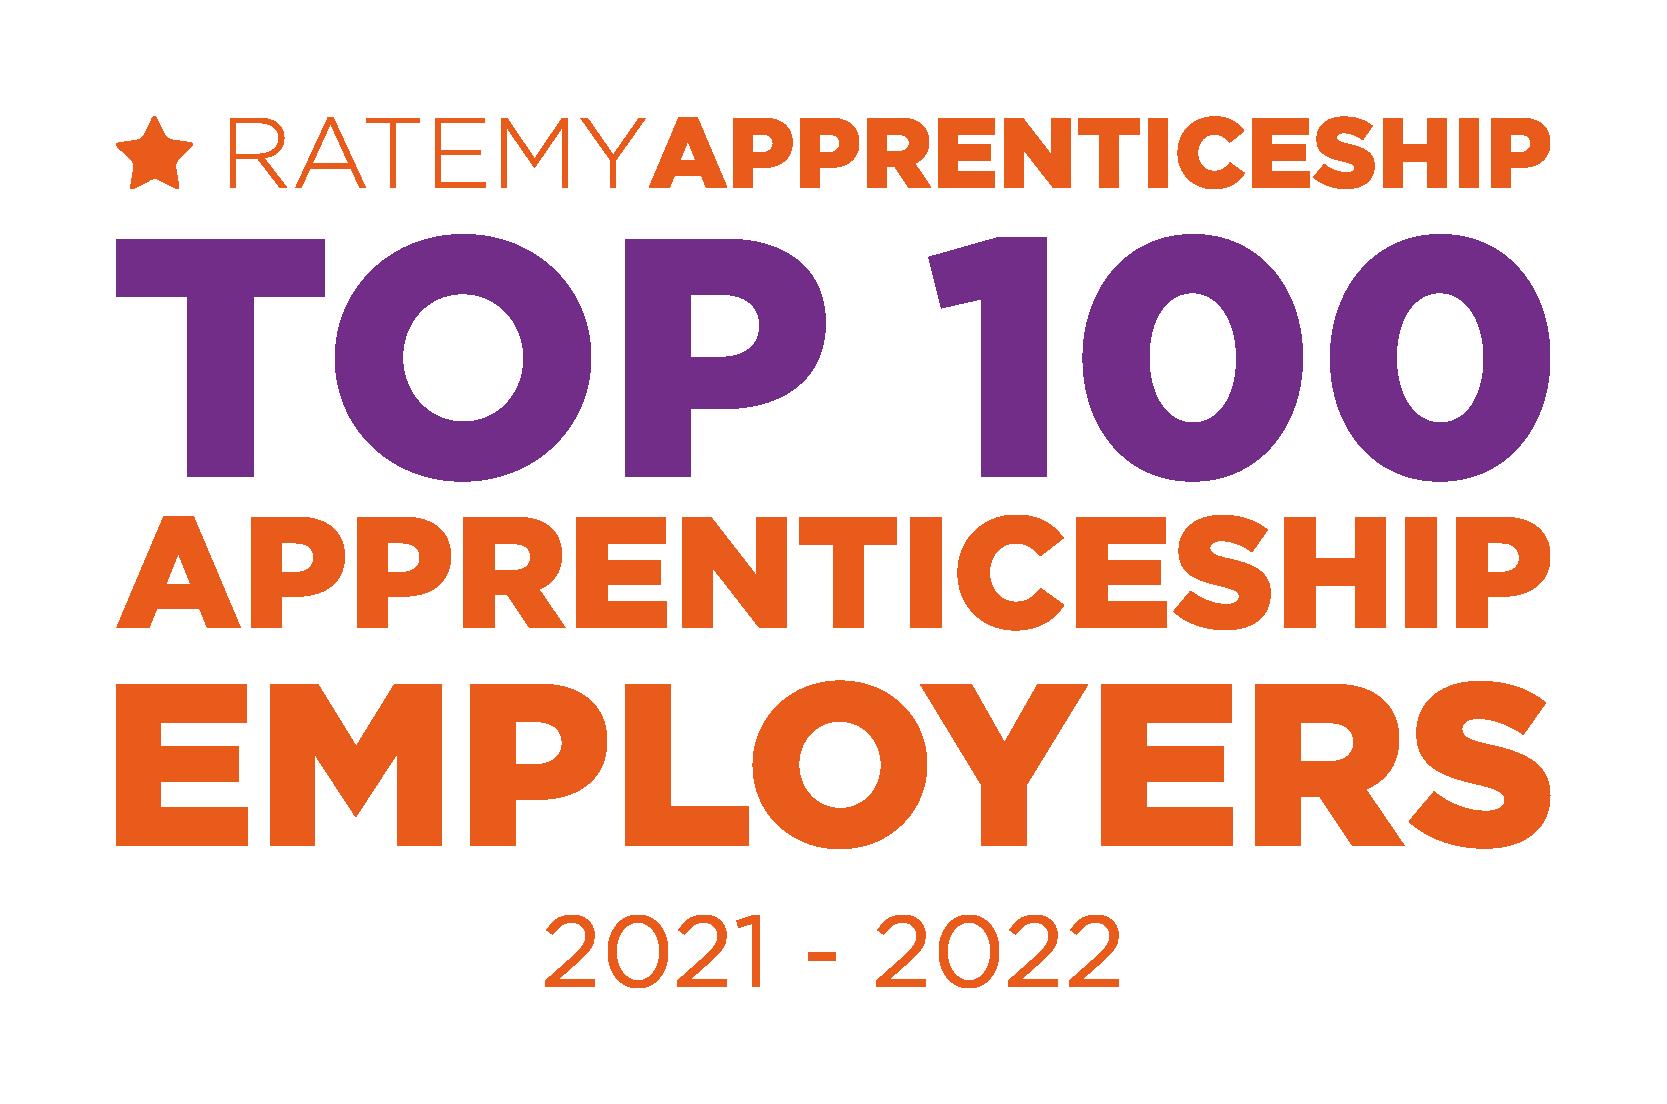 Top 100 EMployers logo